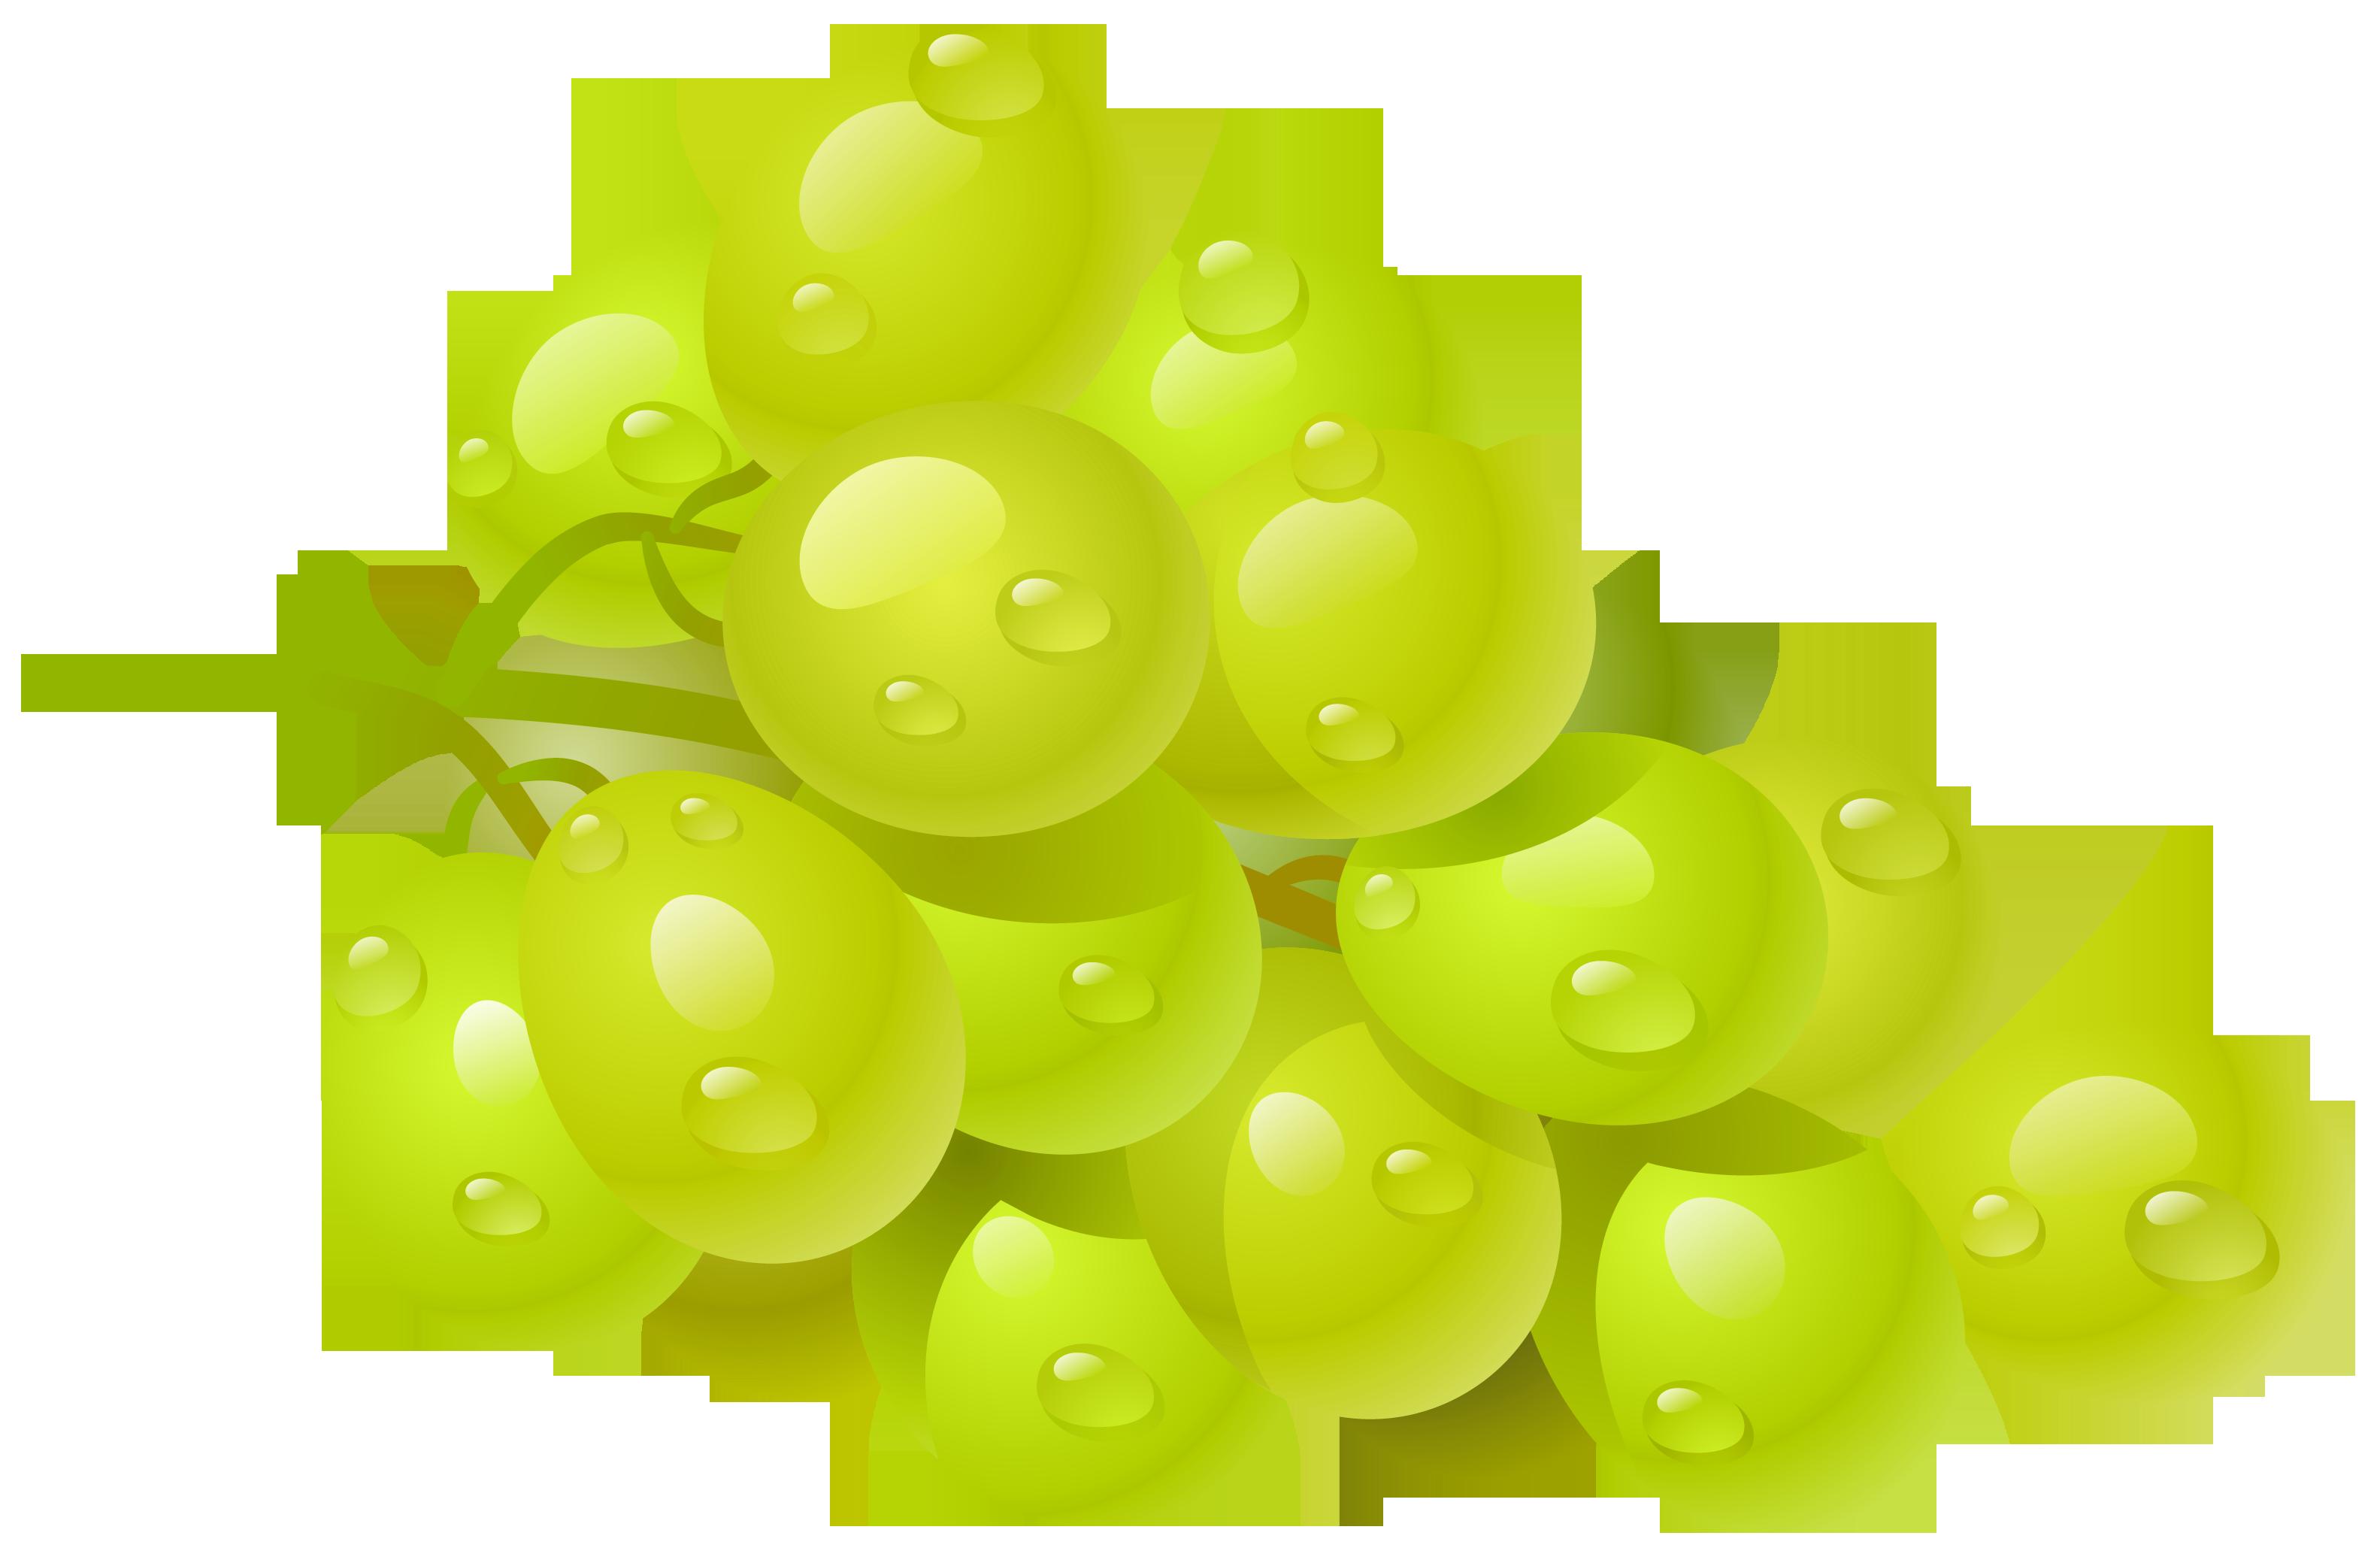 Grapes clip art free clipart images image 2